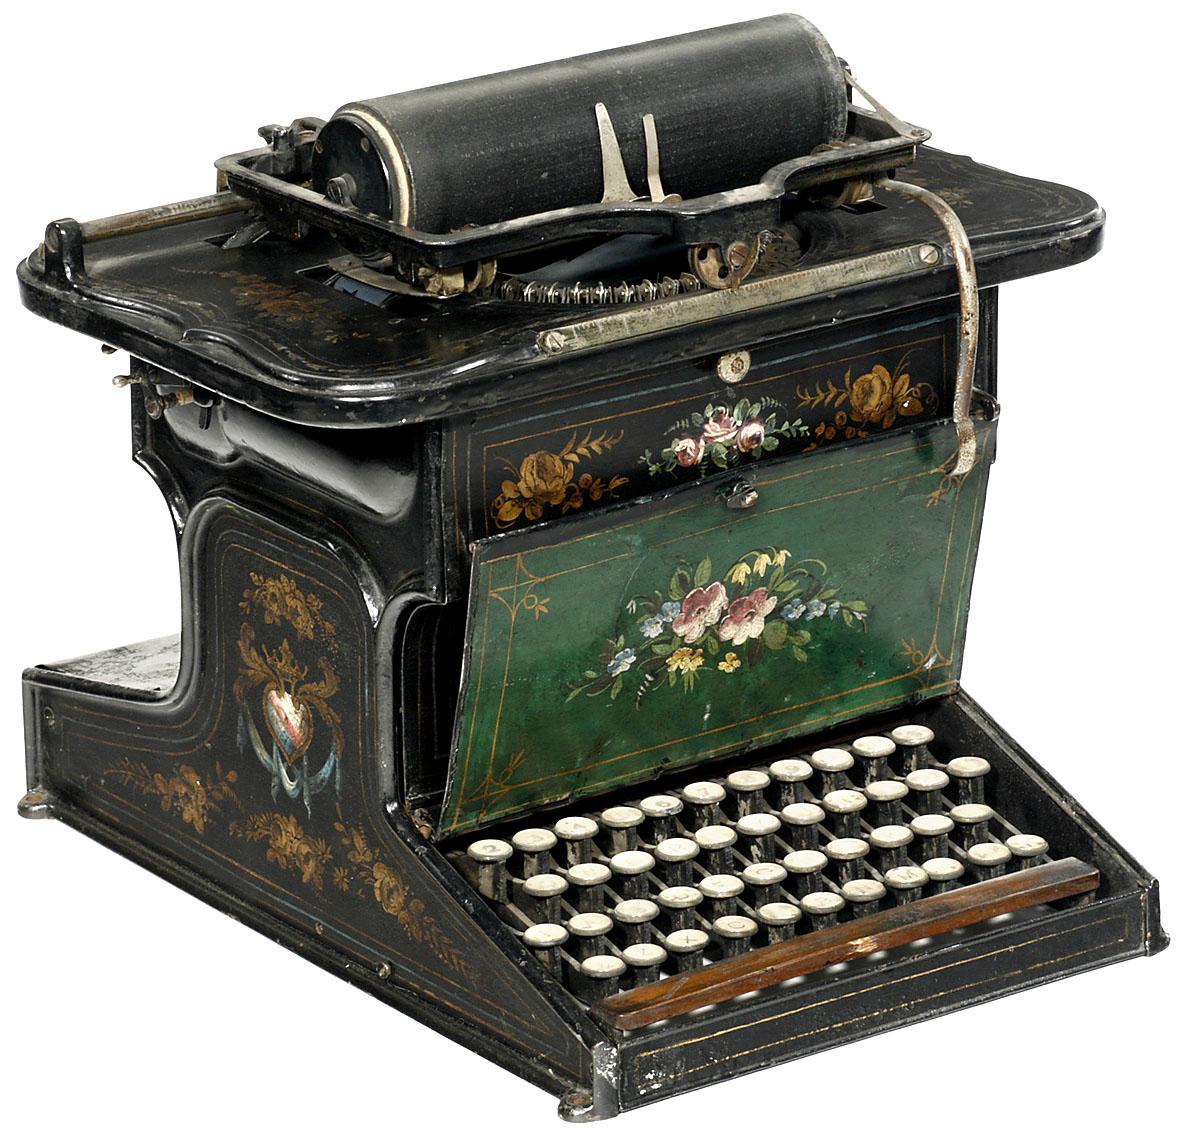 Sholes & Glidden Type Writer 1874